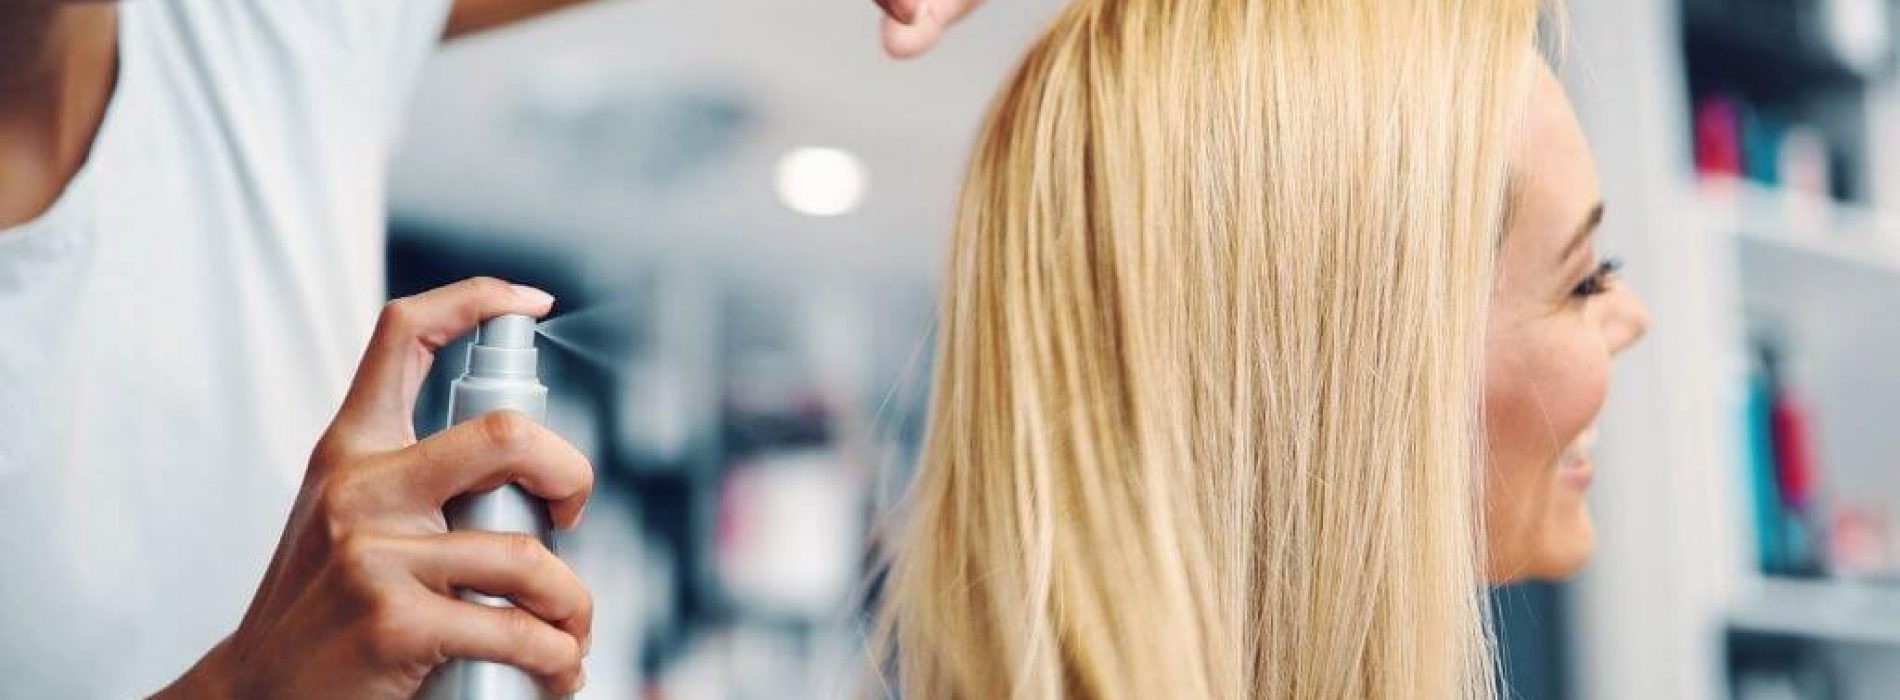 How Do You Choose the Right Hair Salon?